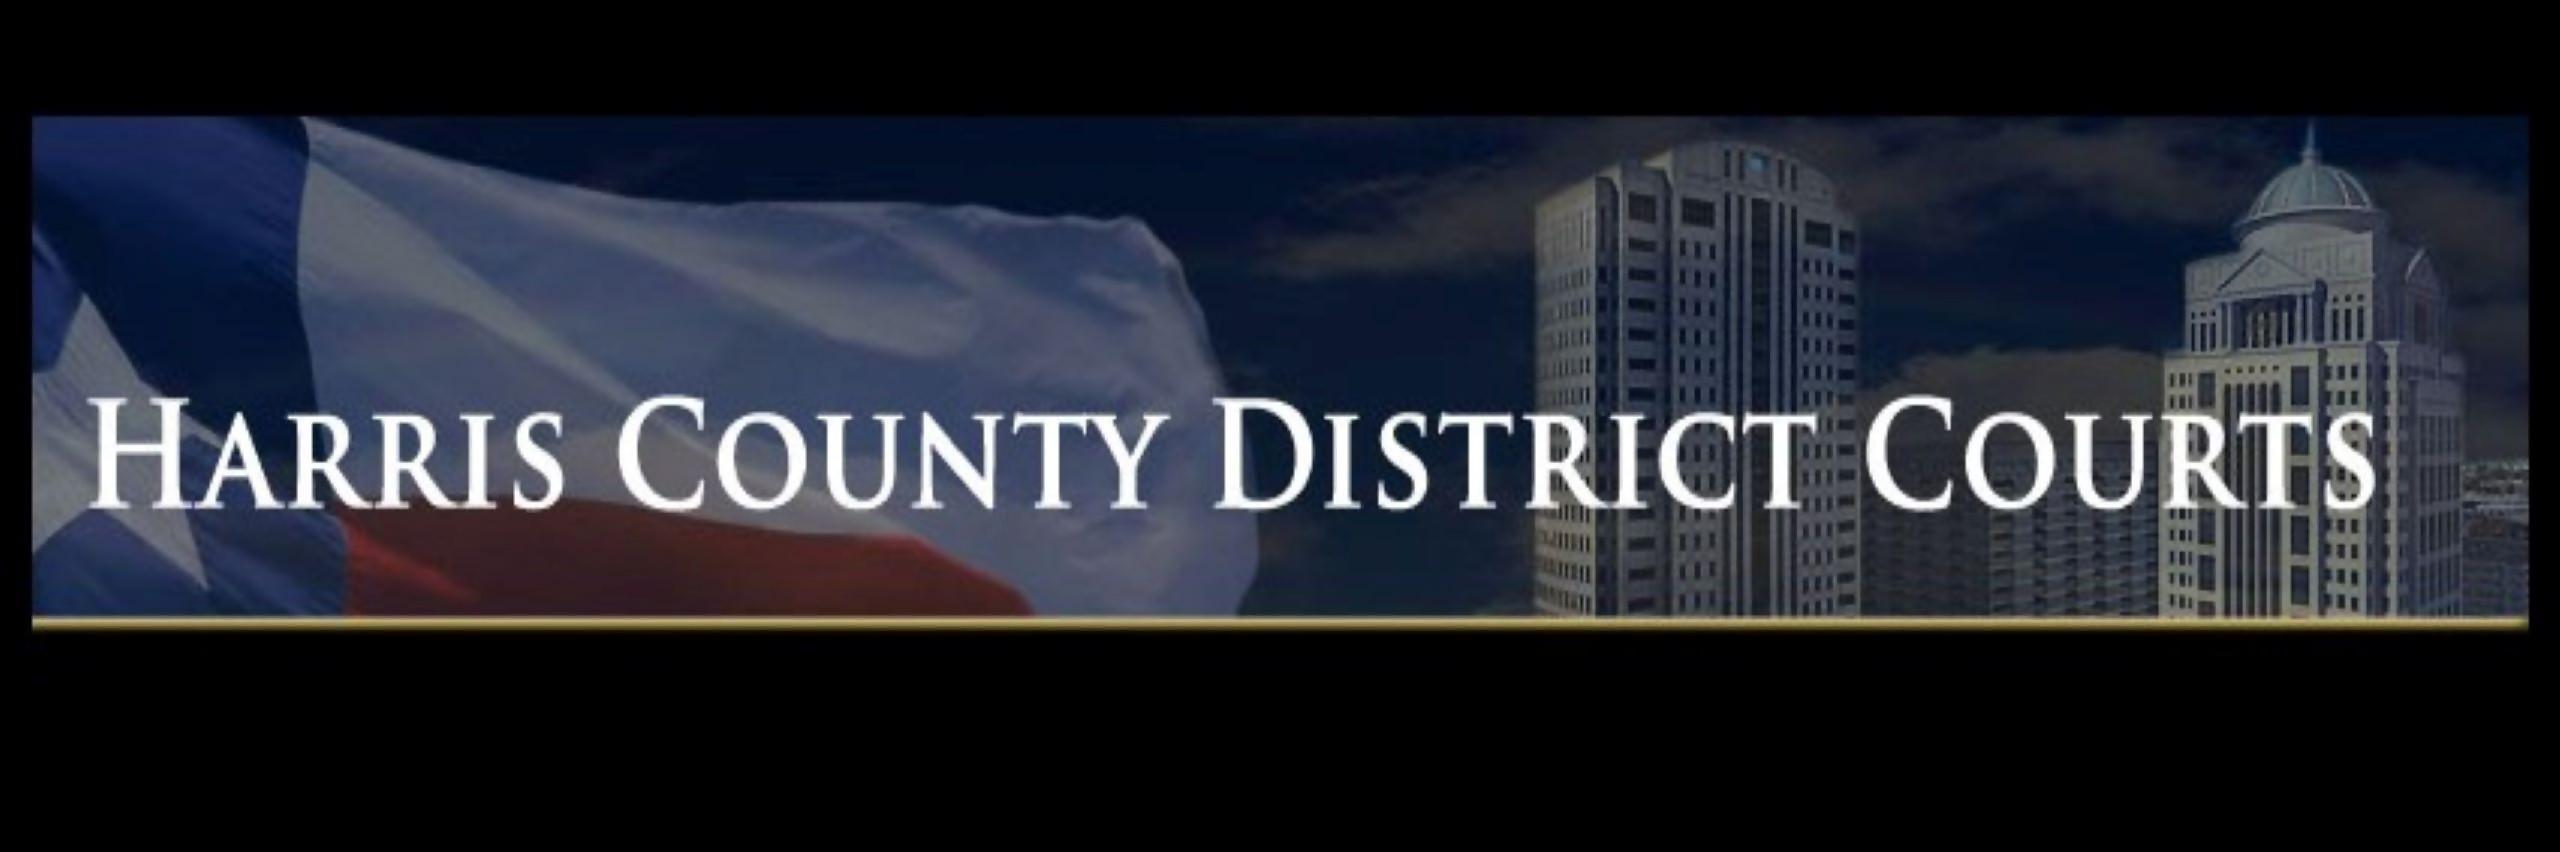 311th District Court AJ - Live Stream